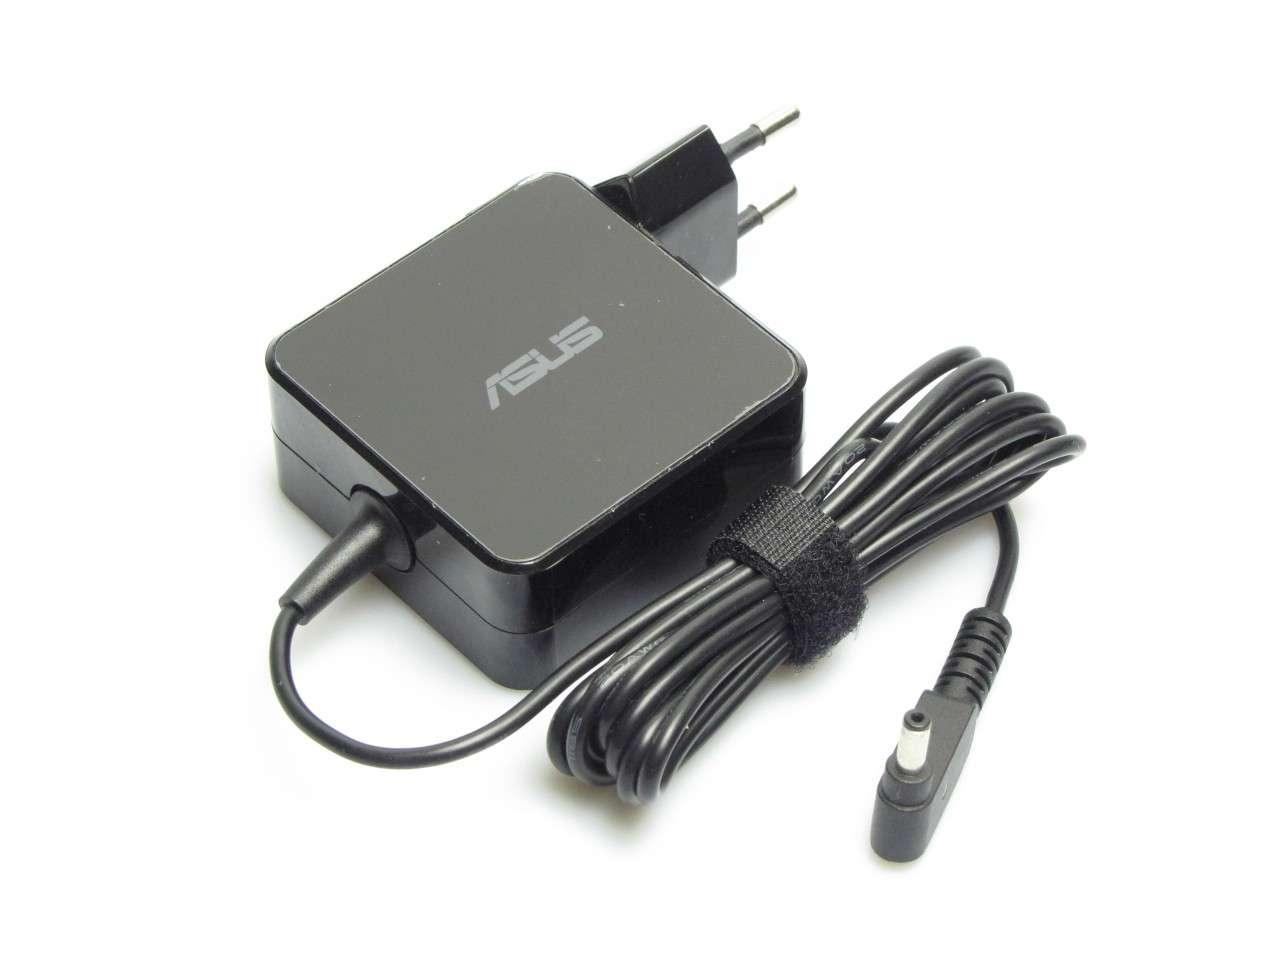 Incarcator Asus X507LA Square Shape 65W imagine powerlaptop.ro 2021